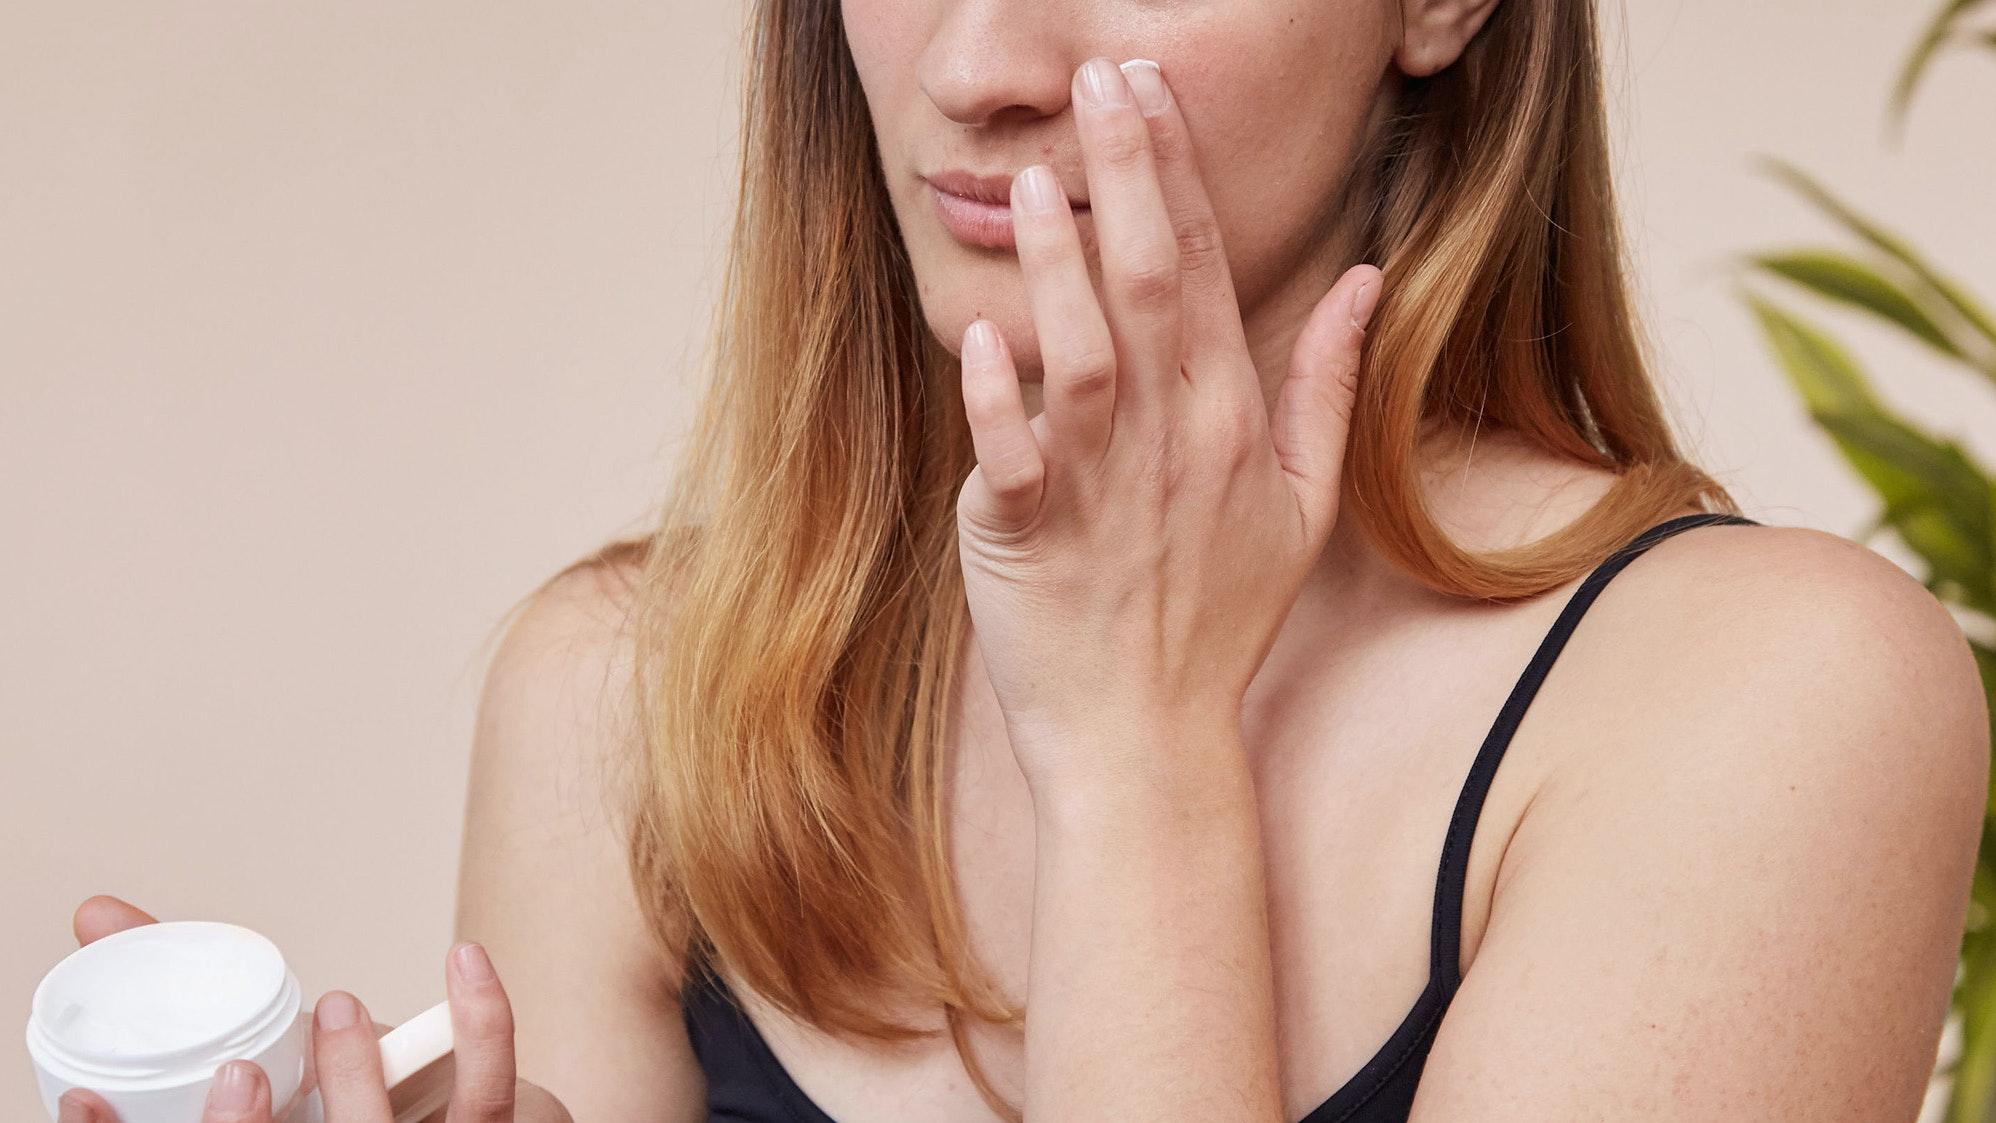 woman applying pimple cream